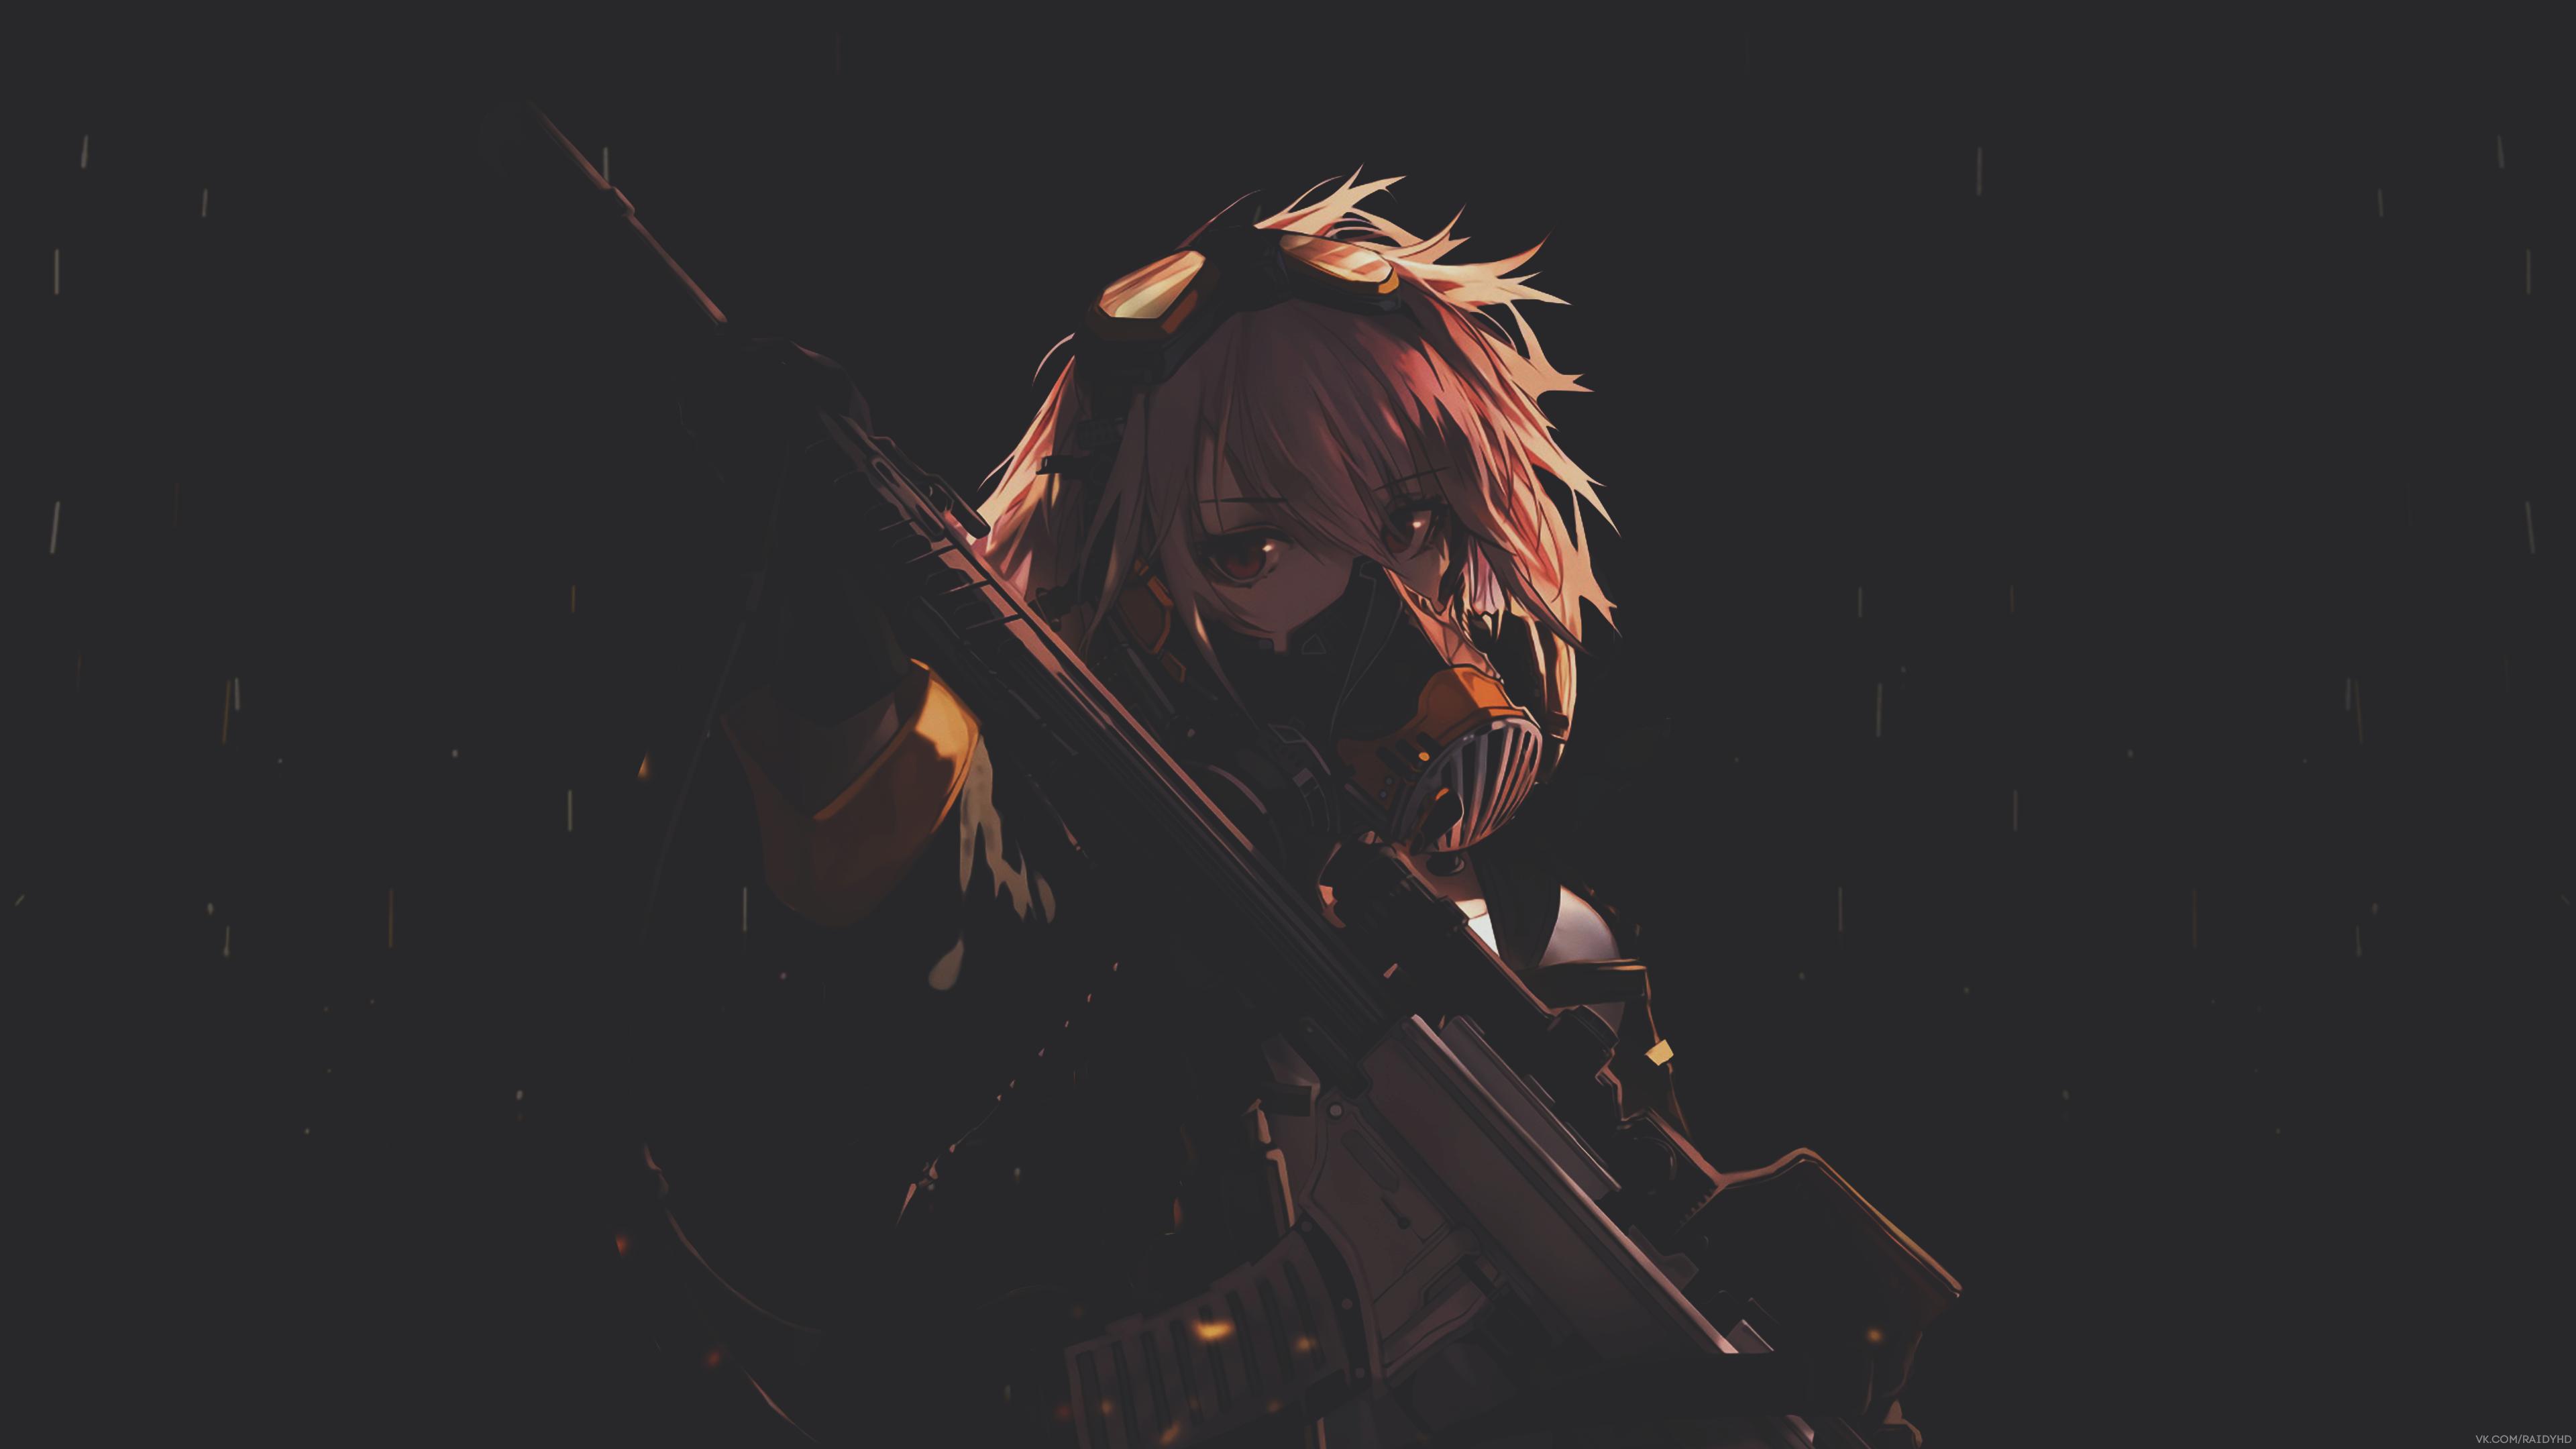 Anime 3840x2160 anime anime girls mask dark weapon simple background black background gun girls with guns